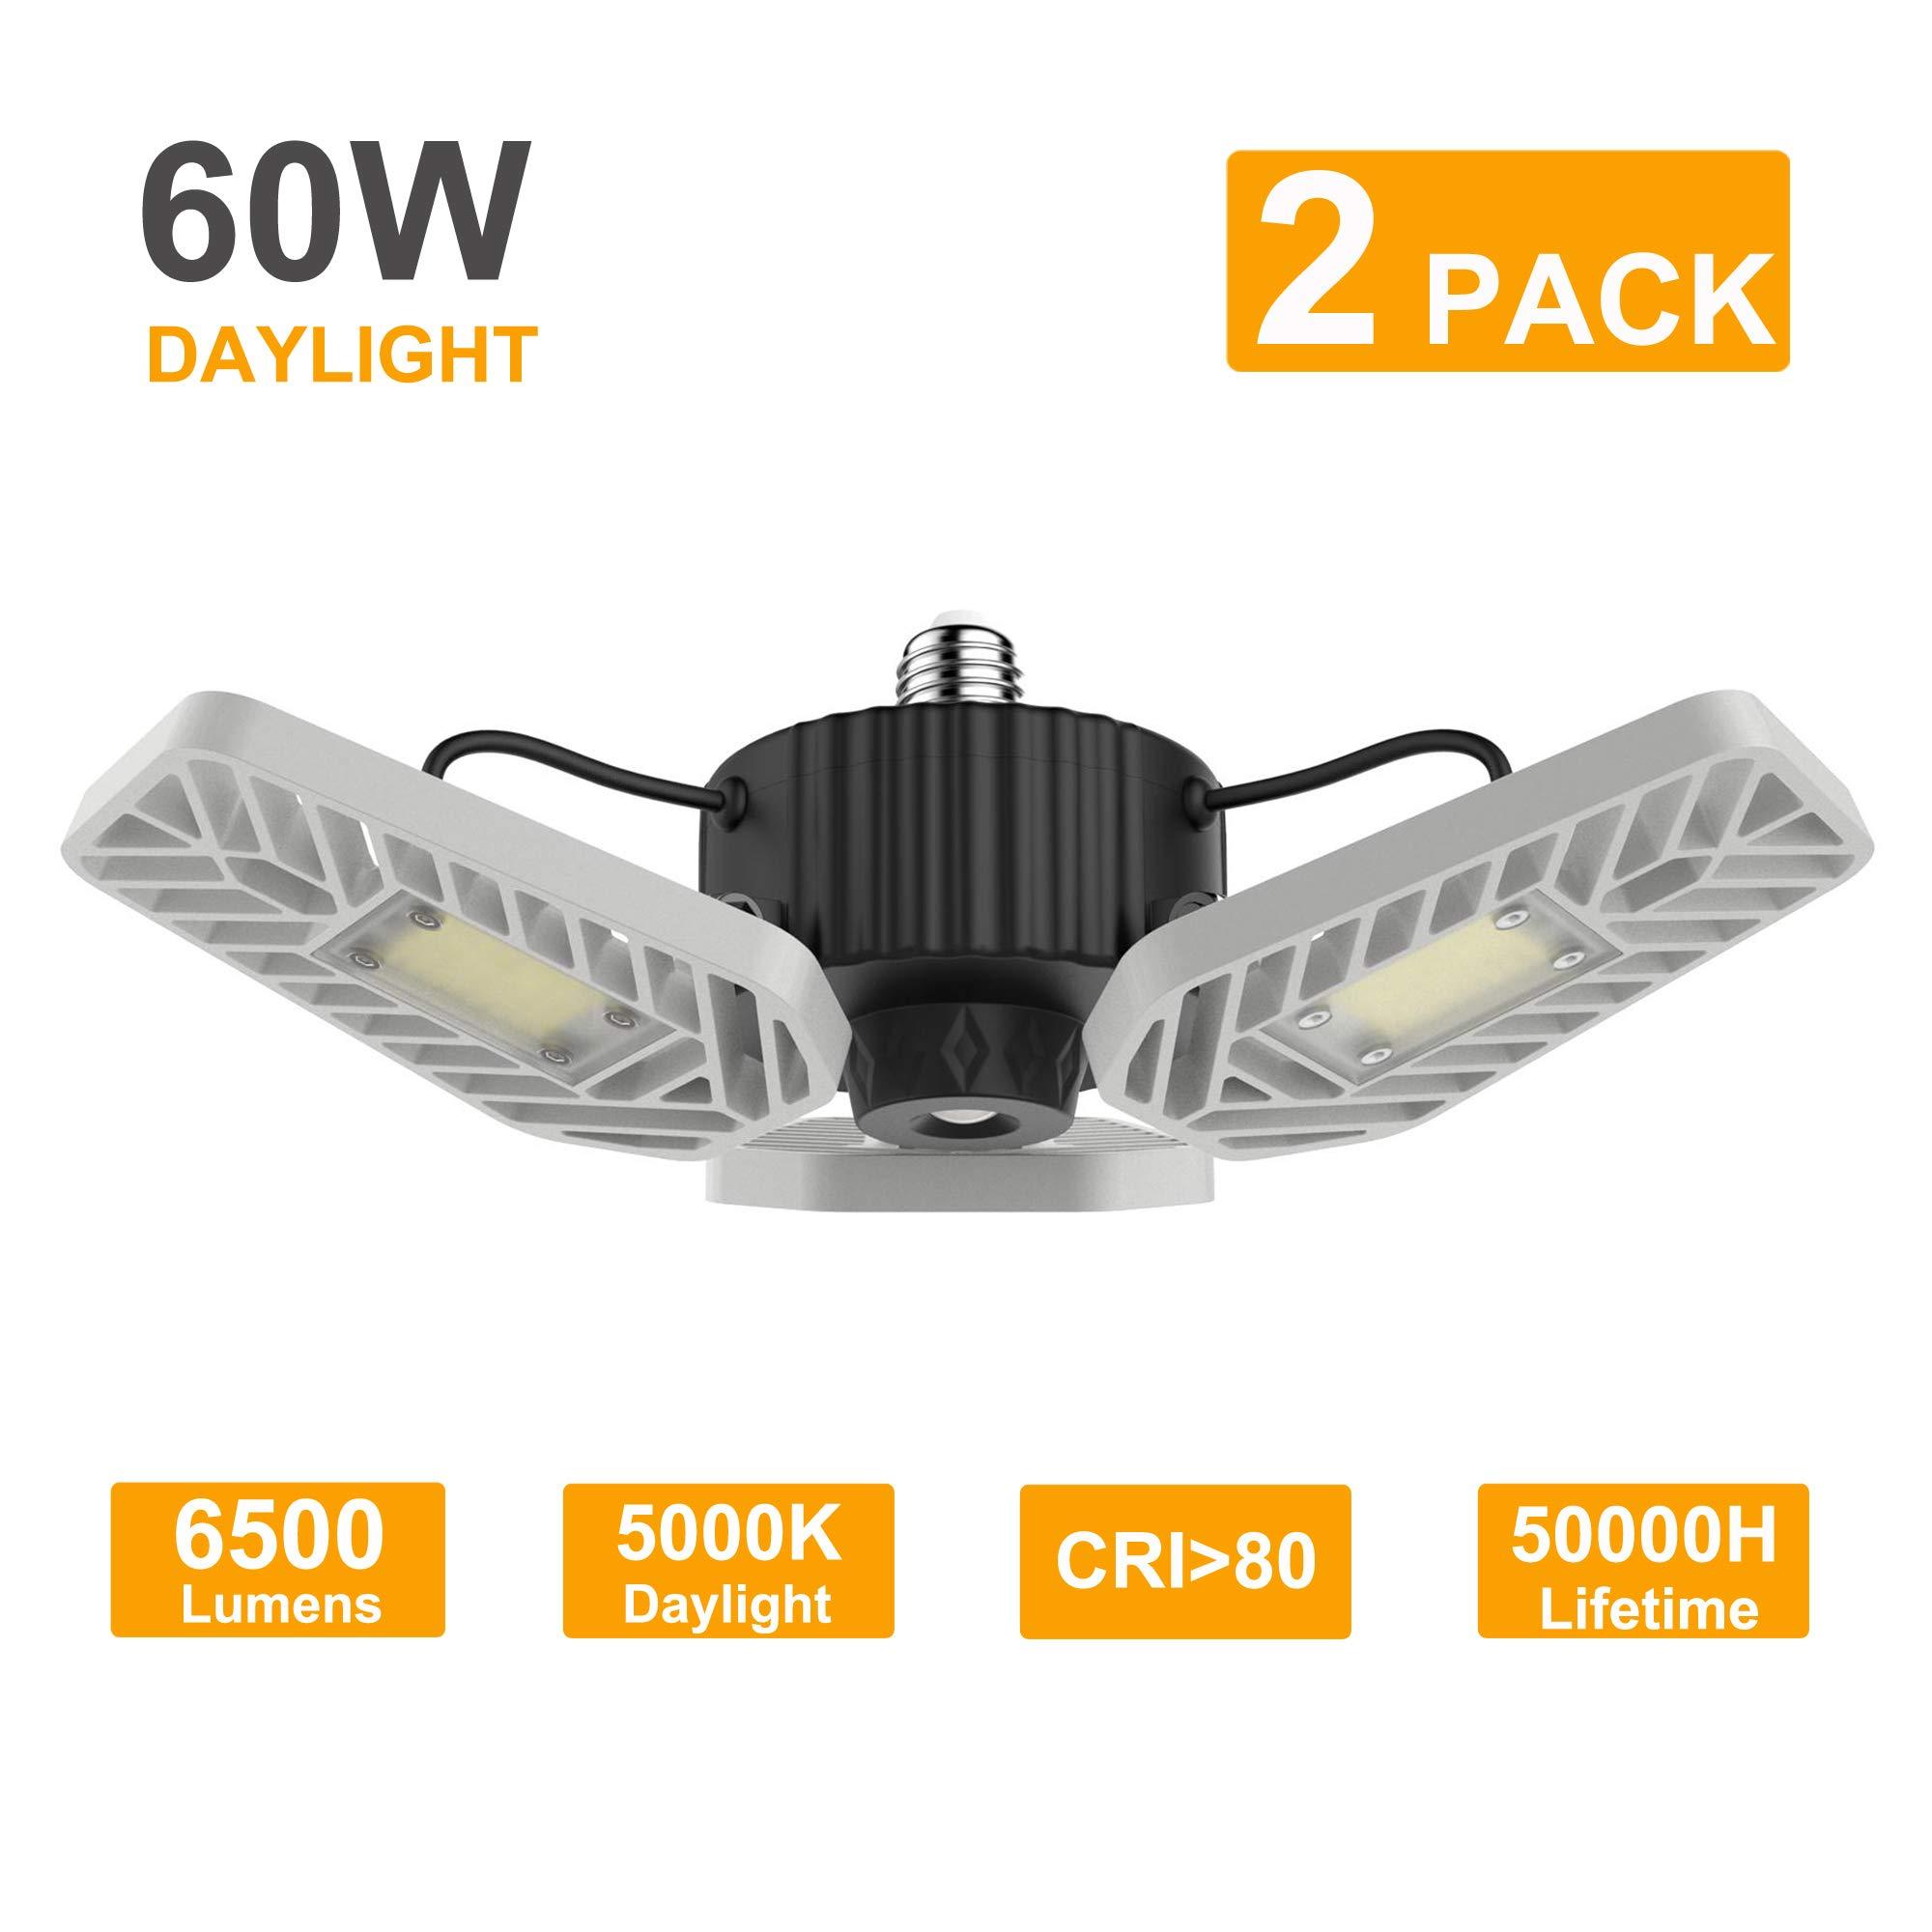 LZHOME 6500Lumens Adjustable Trilights Ceiling